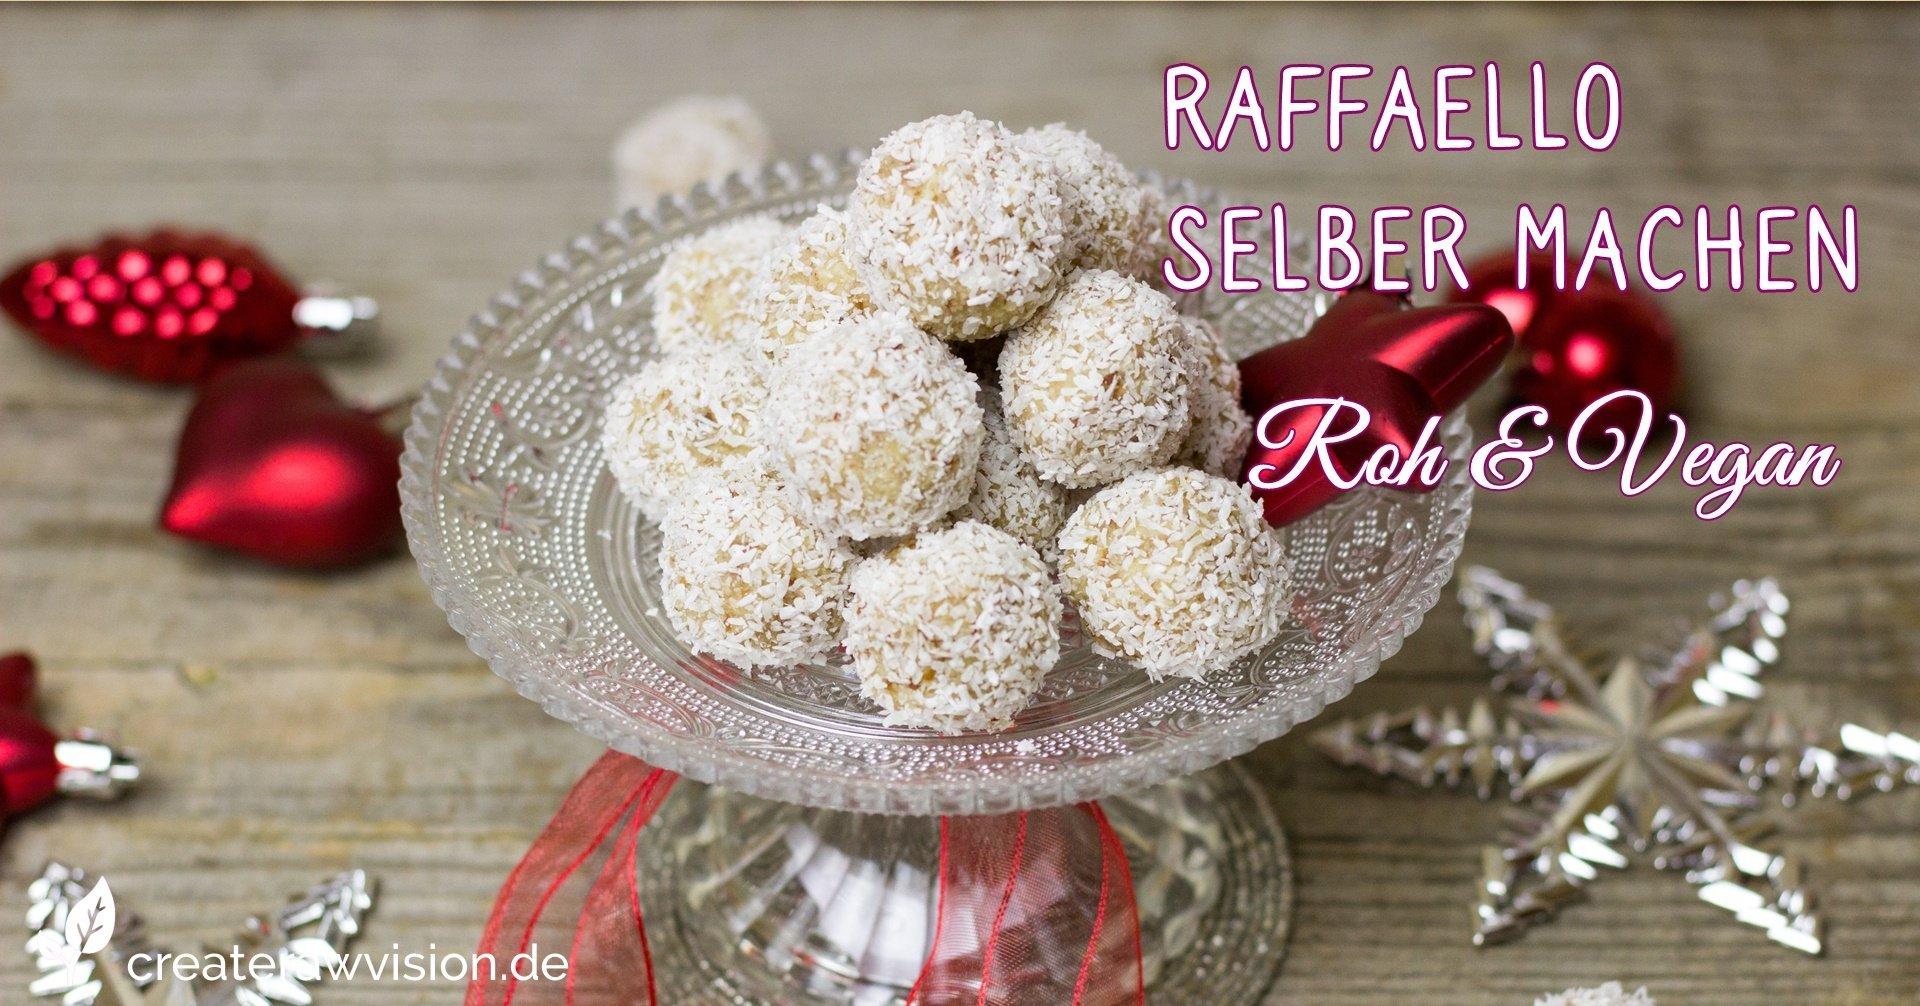 Raffaello auf Teller